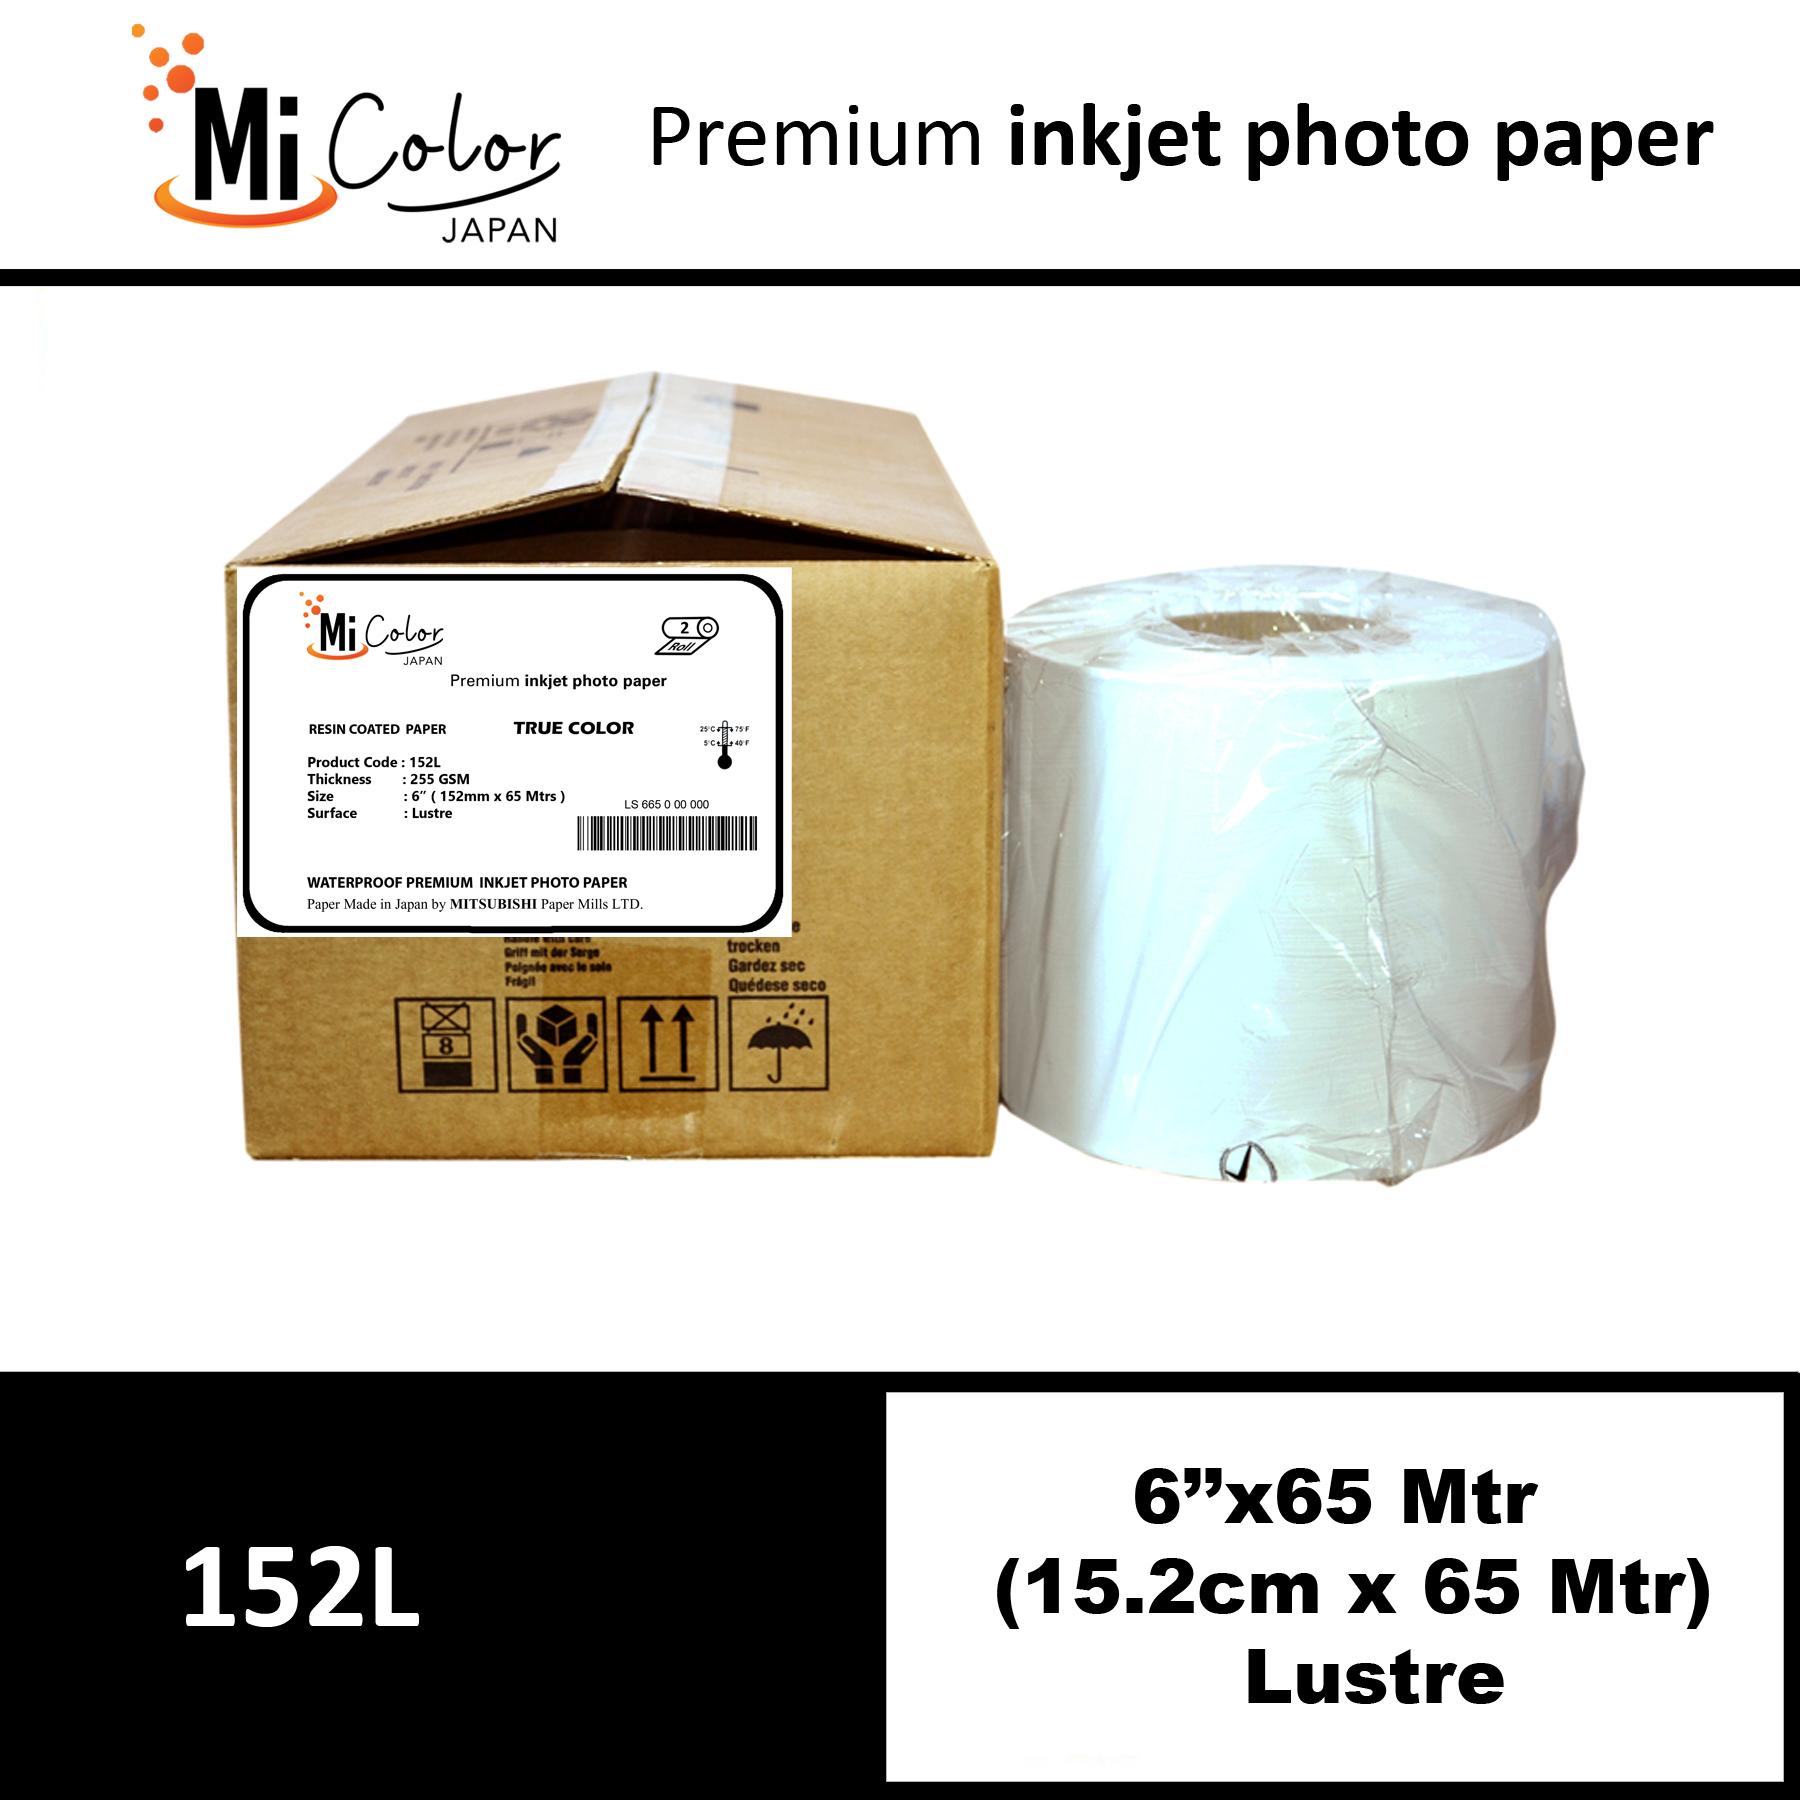 "Mi Color Inkjet RC Paper 6"" x 65 Mtrs Lustre"